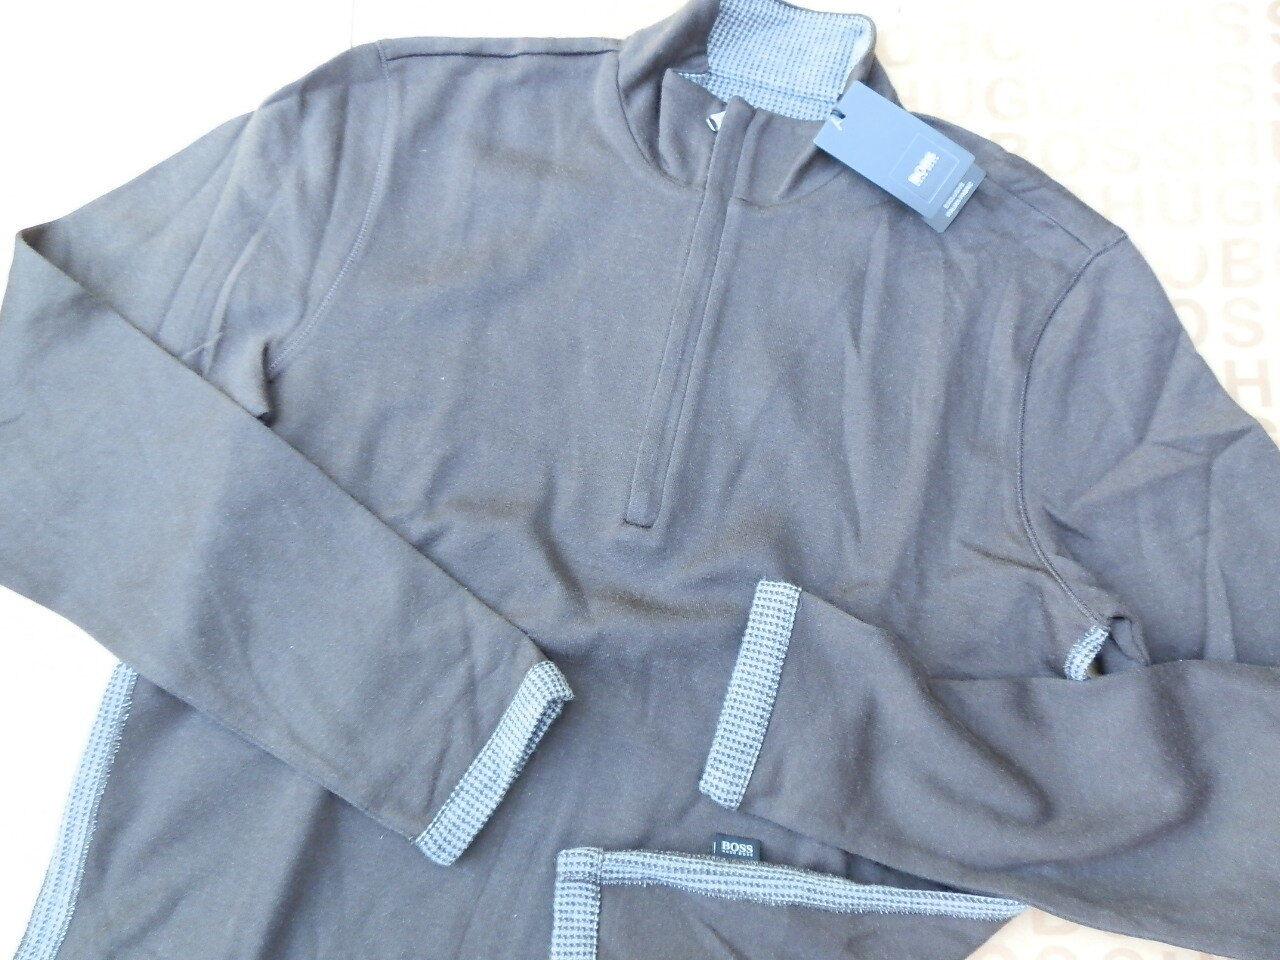 NEW HUGO BOSS  Herren braun ITALIAN KNITWEAR POLO CARDIGAN BAG SWEATER JUMPER SMALL